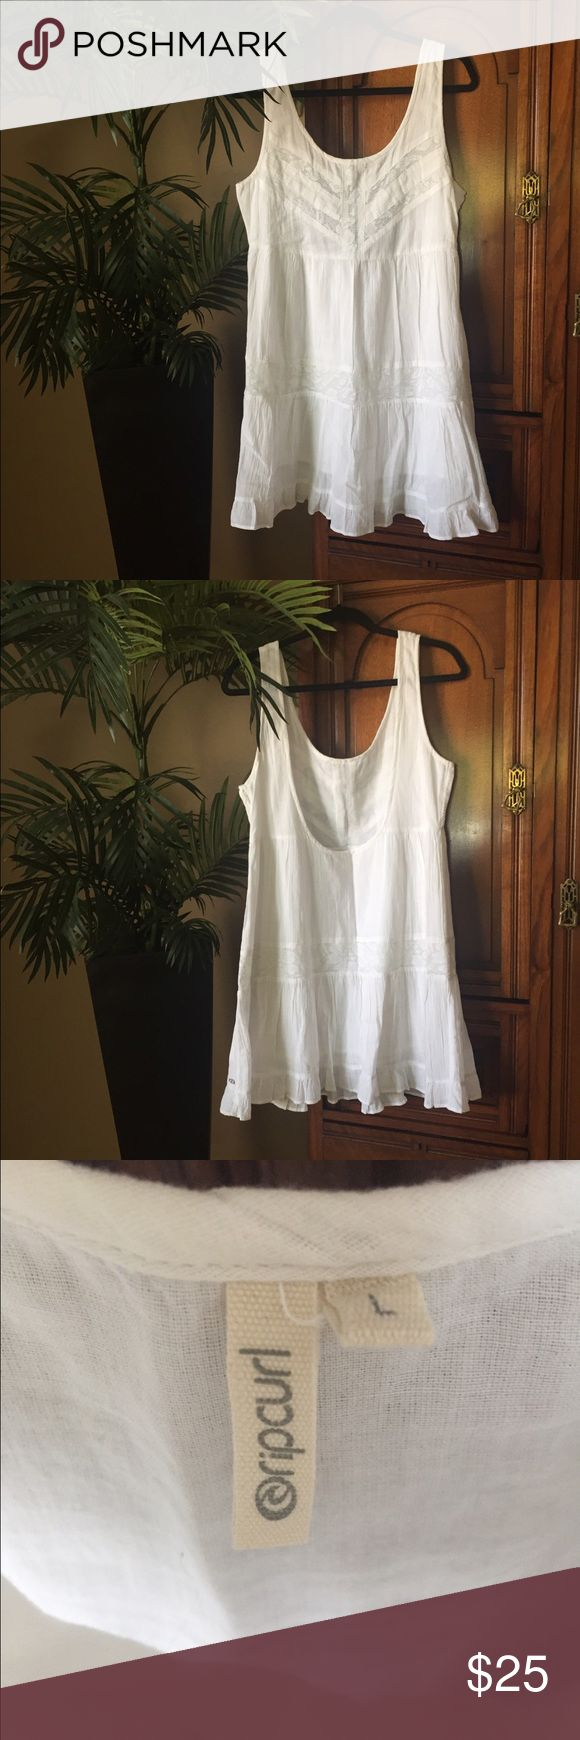 RipCurl Super Cute White Cotton Lace Dress SZ L-XL RipCurl Super Cute White Cotton Lace Dress SZ L-XL RipCurl Dresses